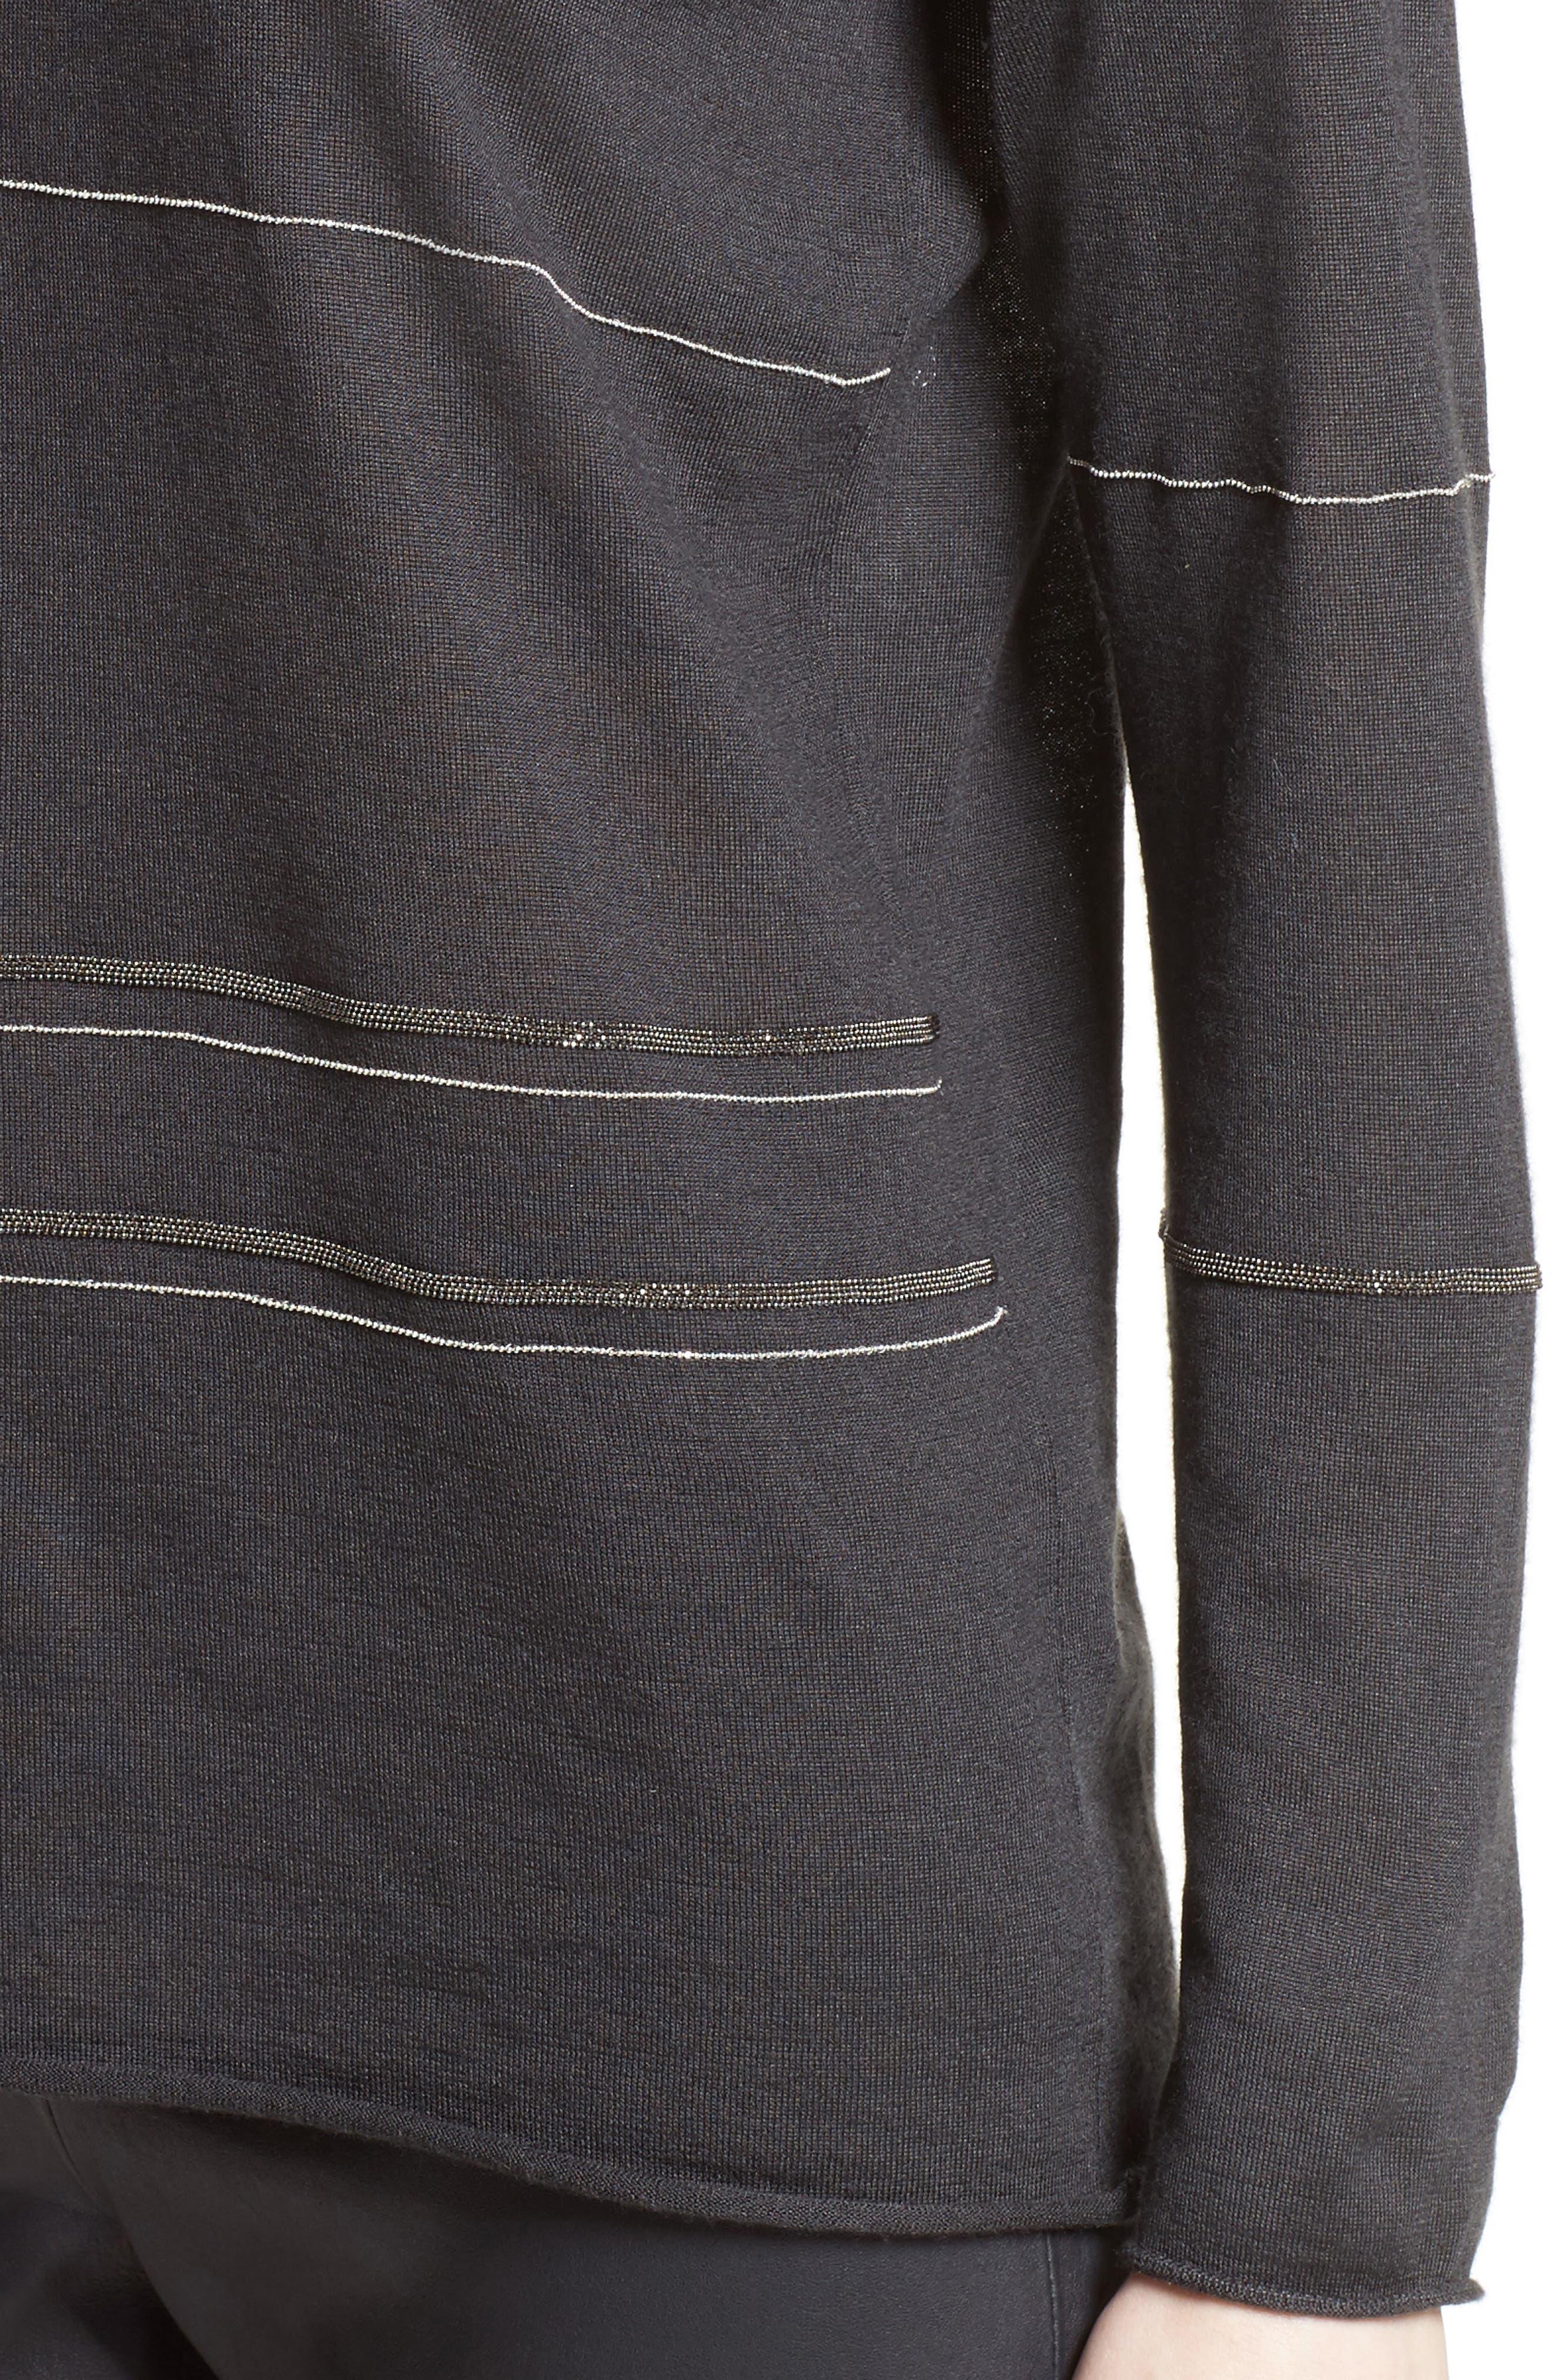 Cashmere & Silk Turtleneck Sweater,                             Alternate thumbnail 4, color,                             021